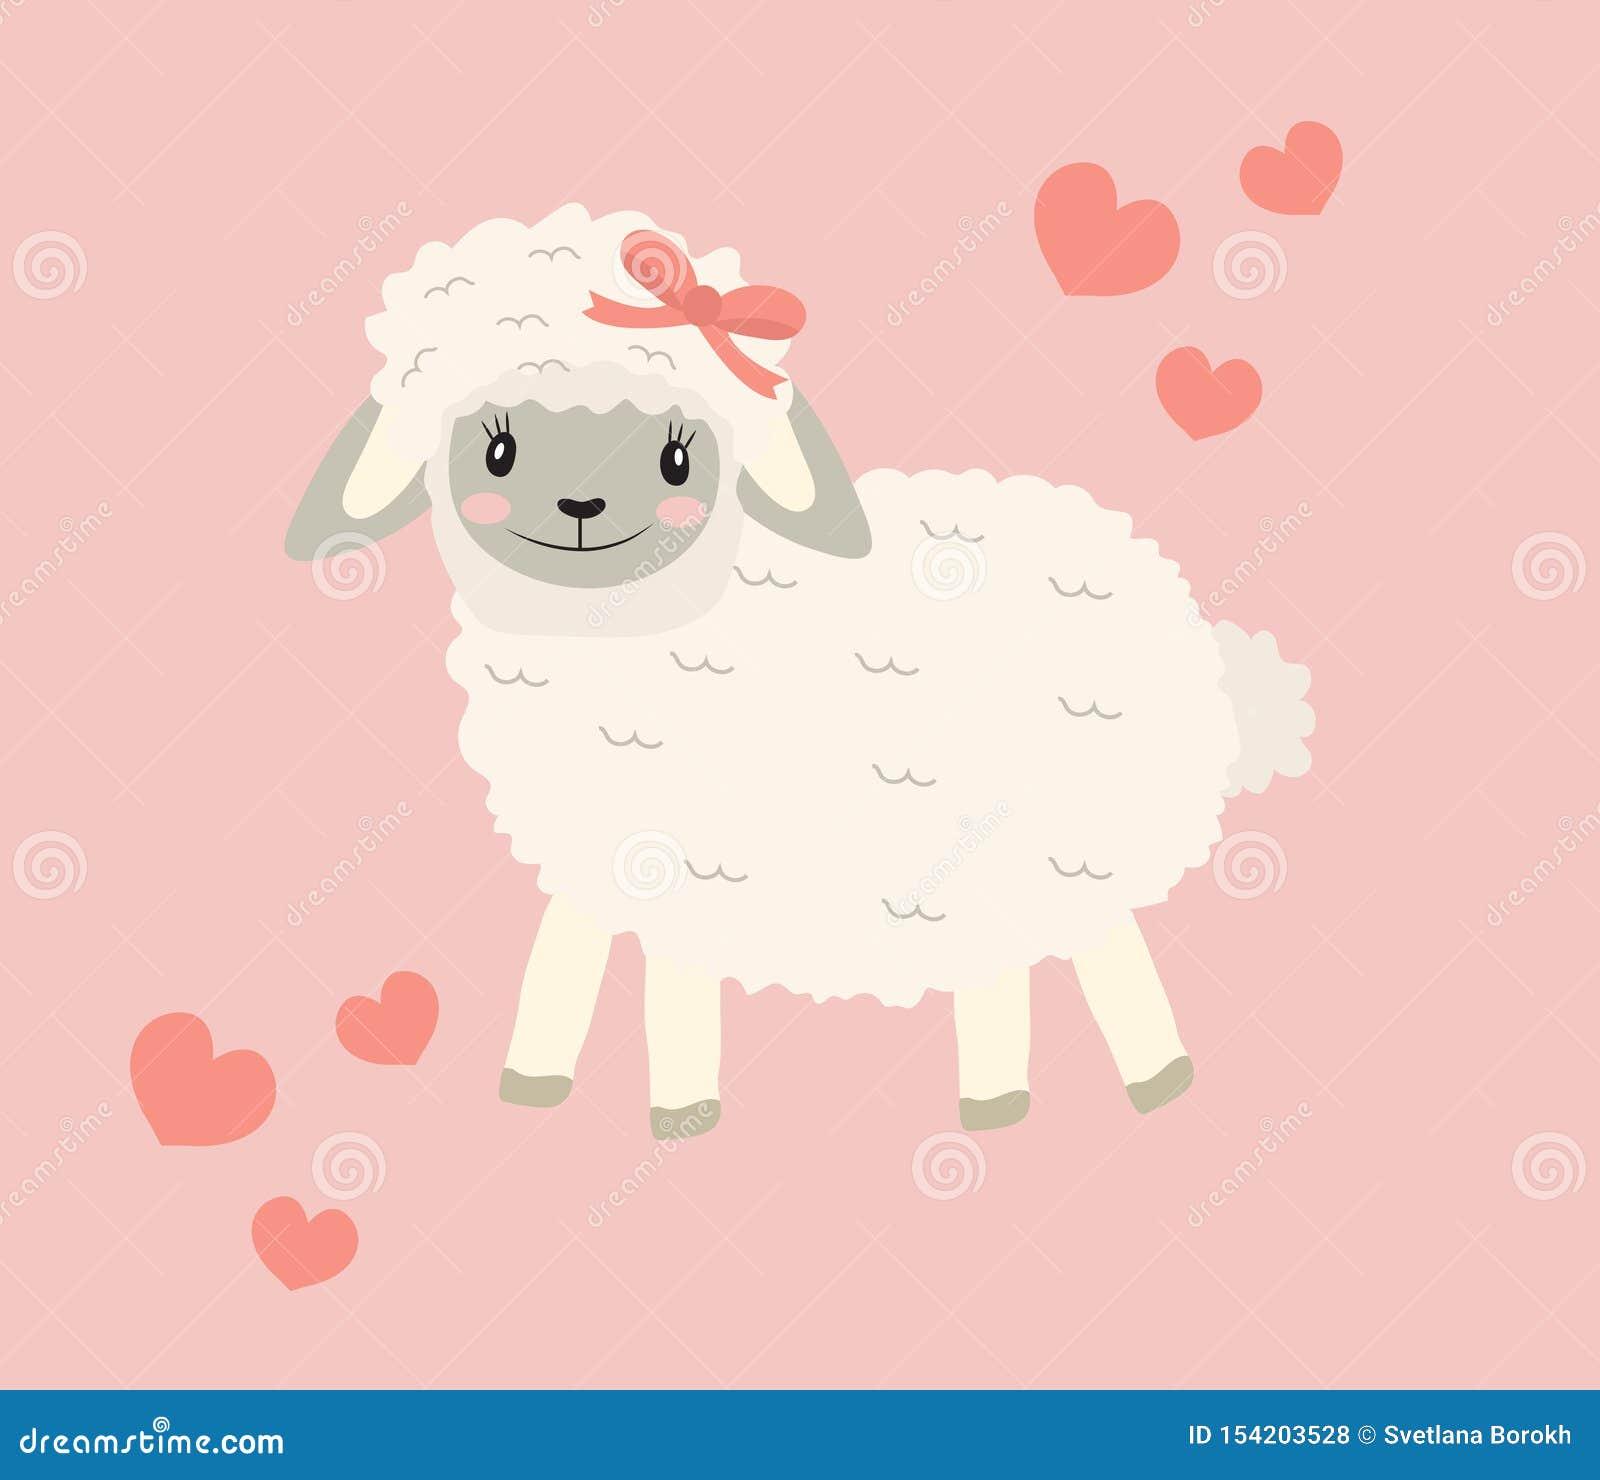 Sheep Clip Art Stock Illustrations 4 059 Sheep Clip Art Stock Illustrations Vectors Clipart Dreamstime